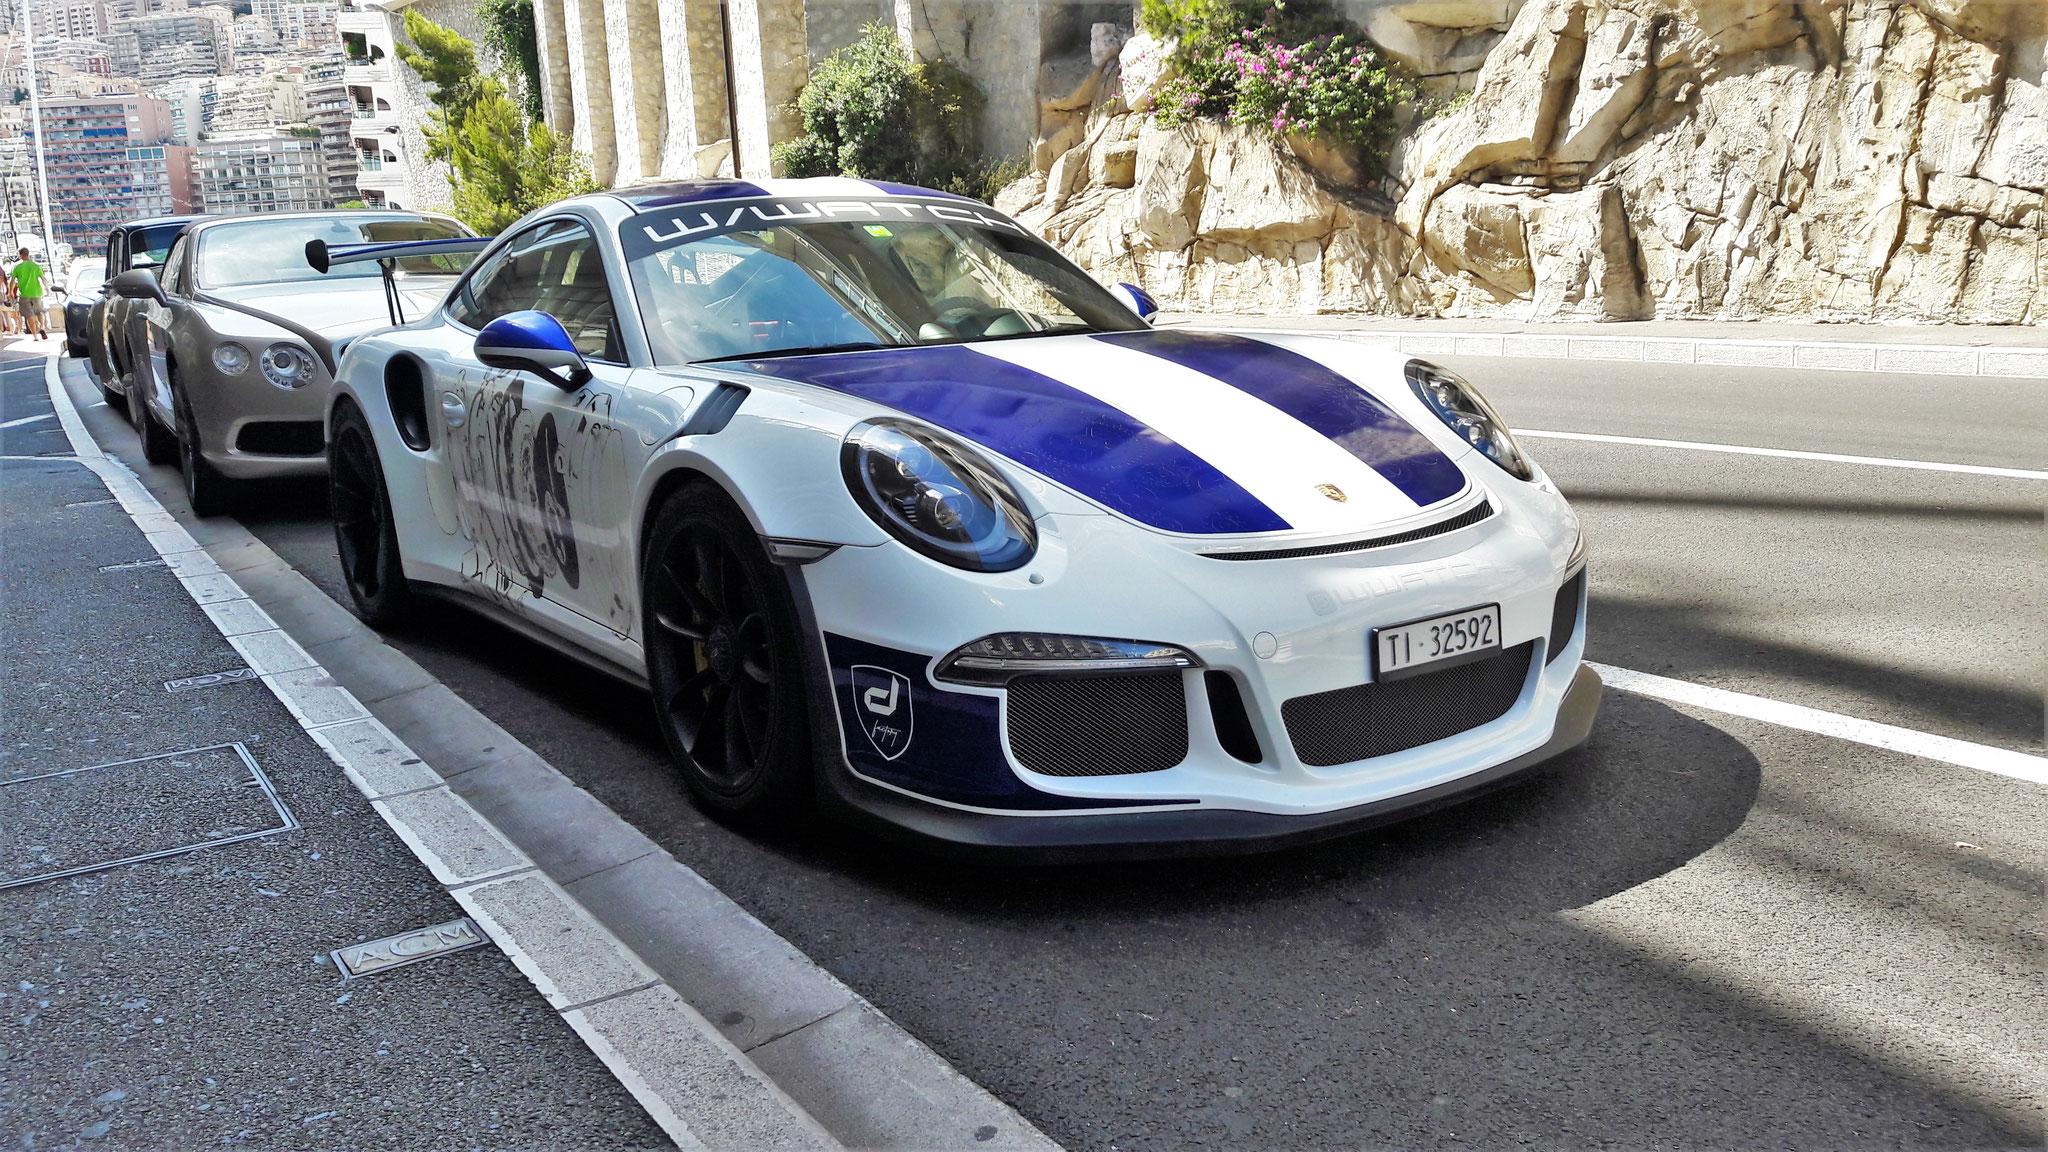 Porsche 911 GT3 RS - TI-32592 (CH)